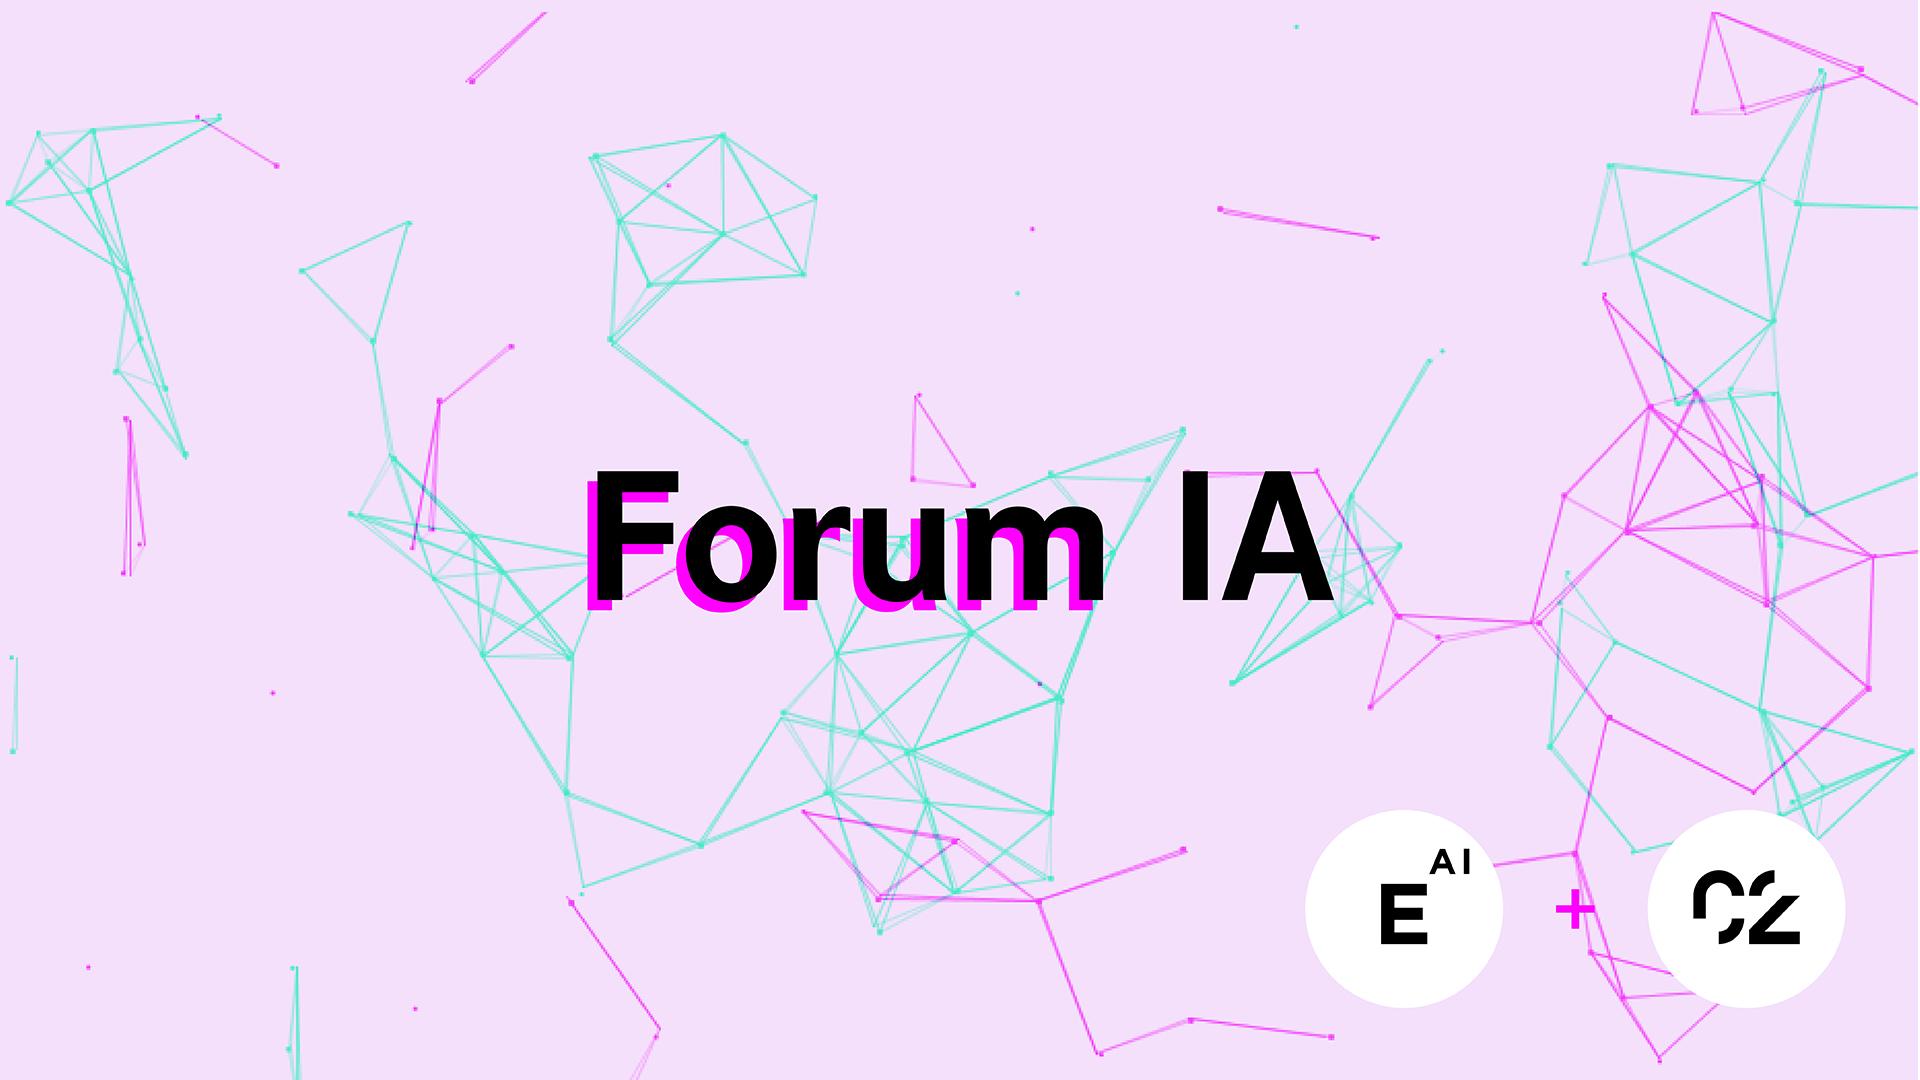 Forum IA